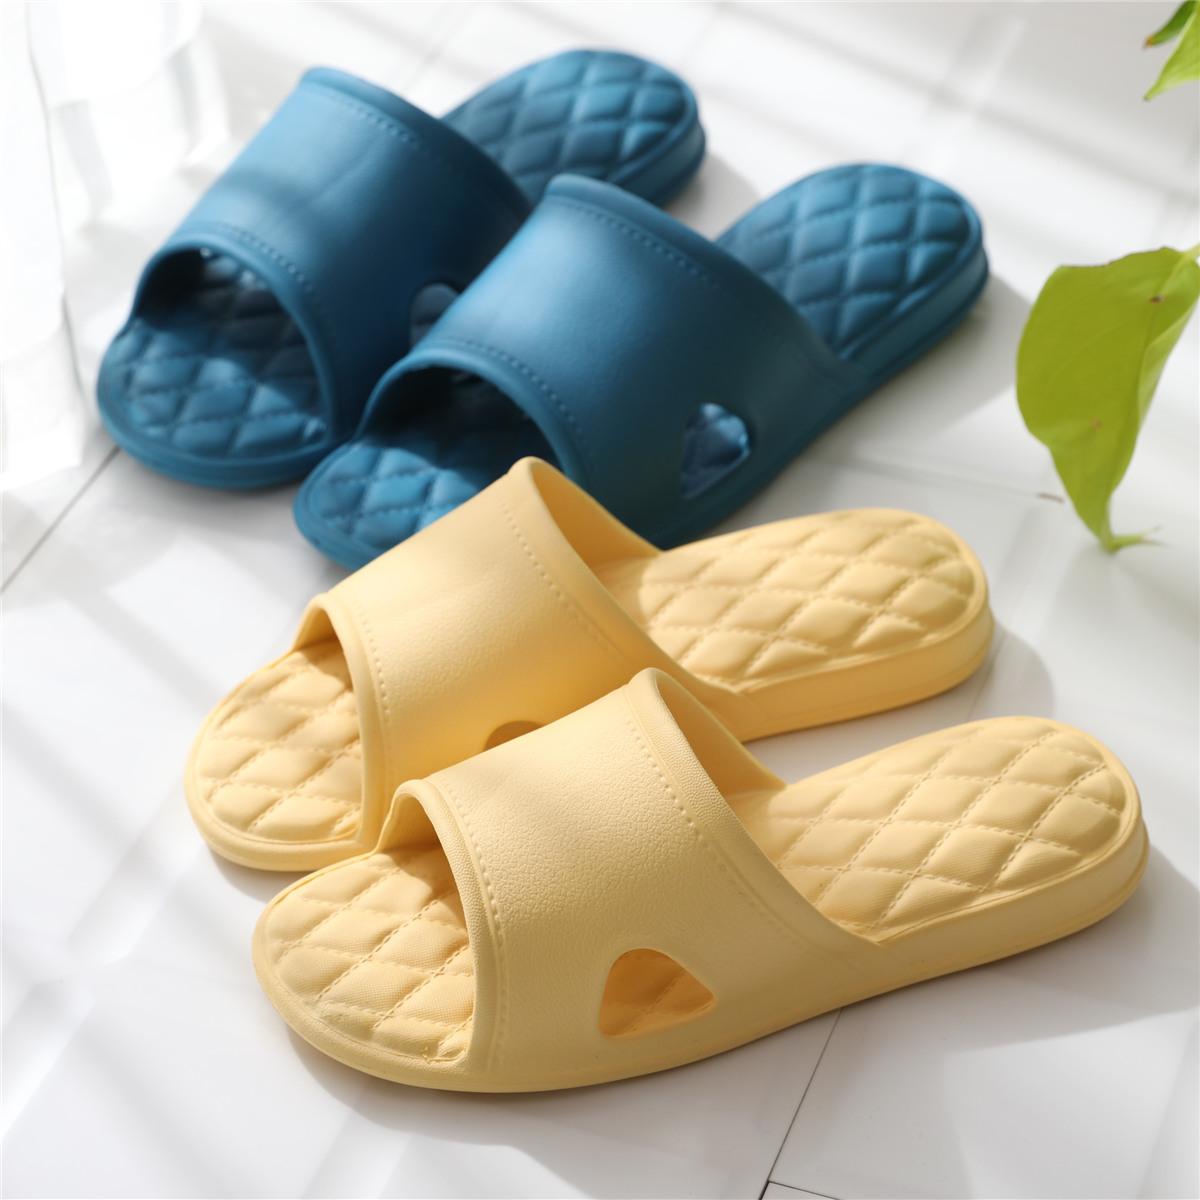 Slippers mens summer indoor lovers home home non slip soft bottom bath slippers womens summer cool slippers